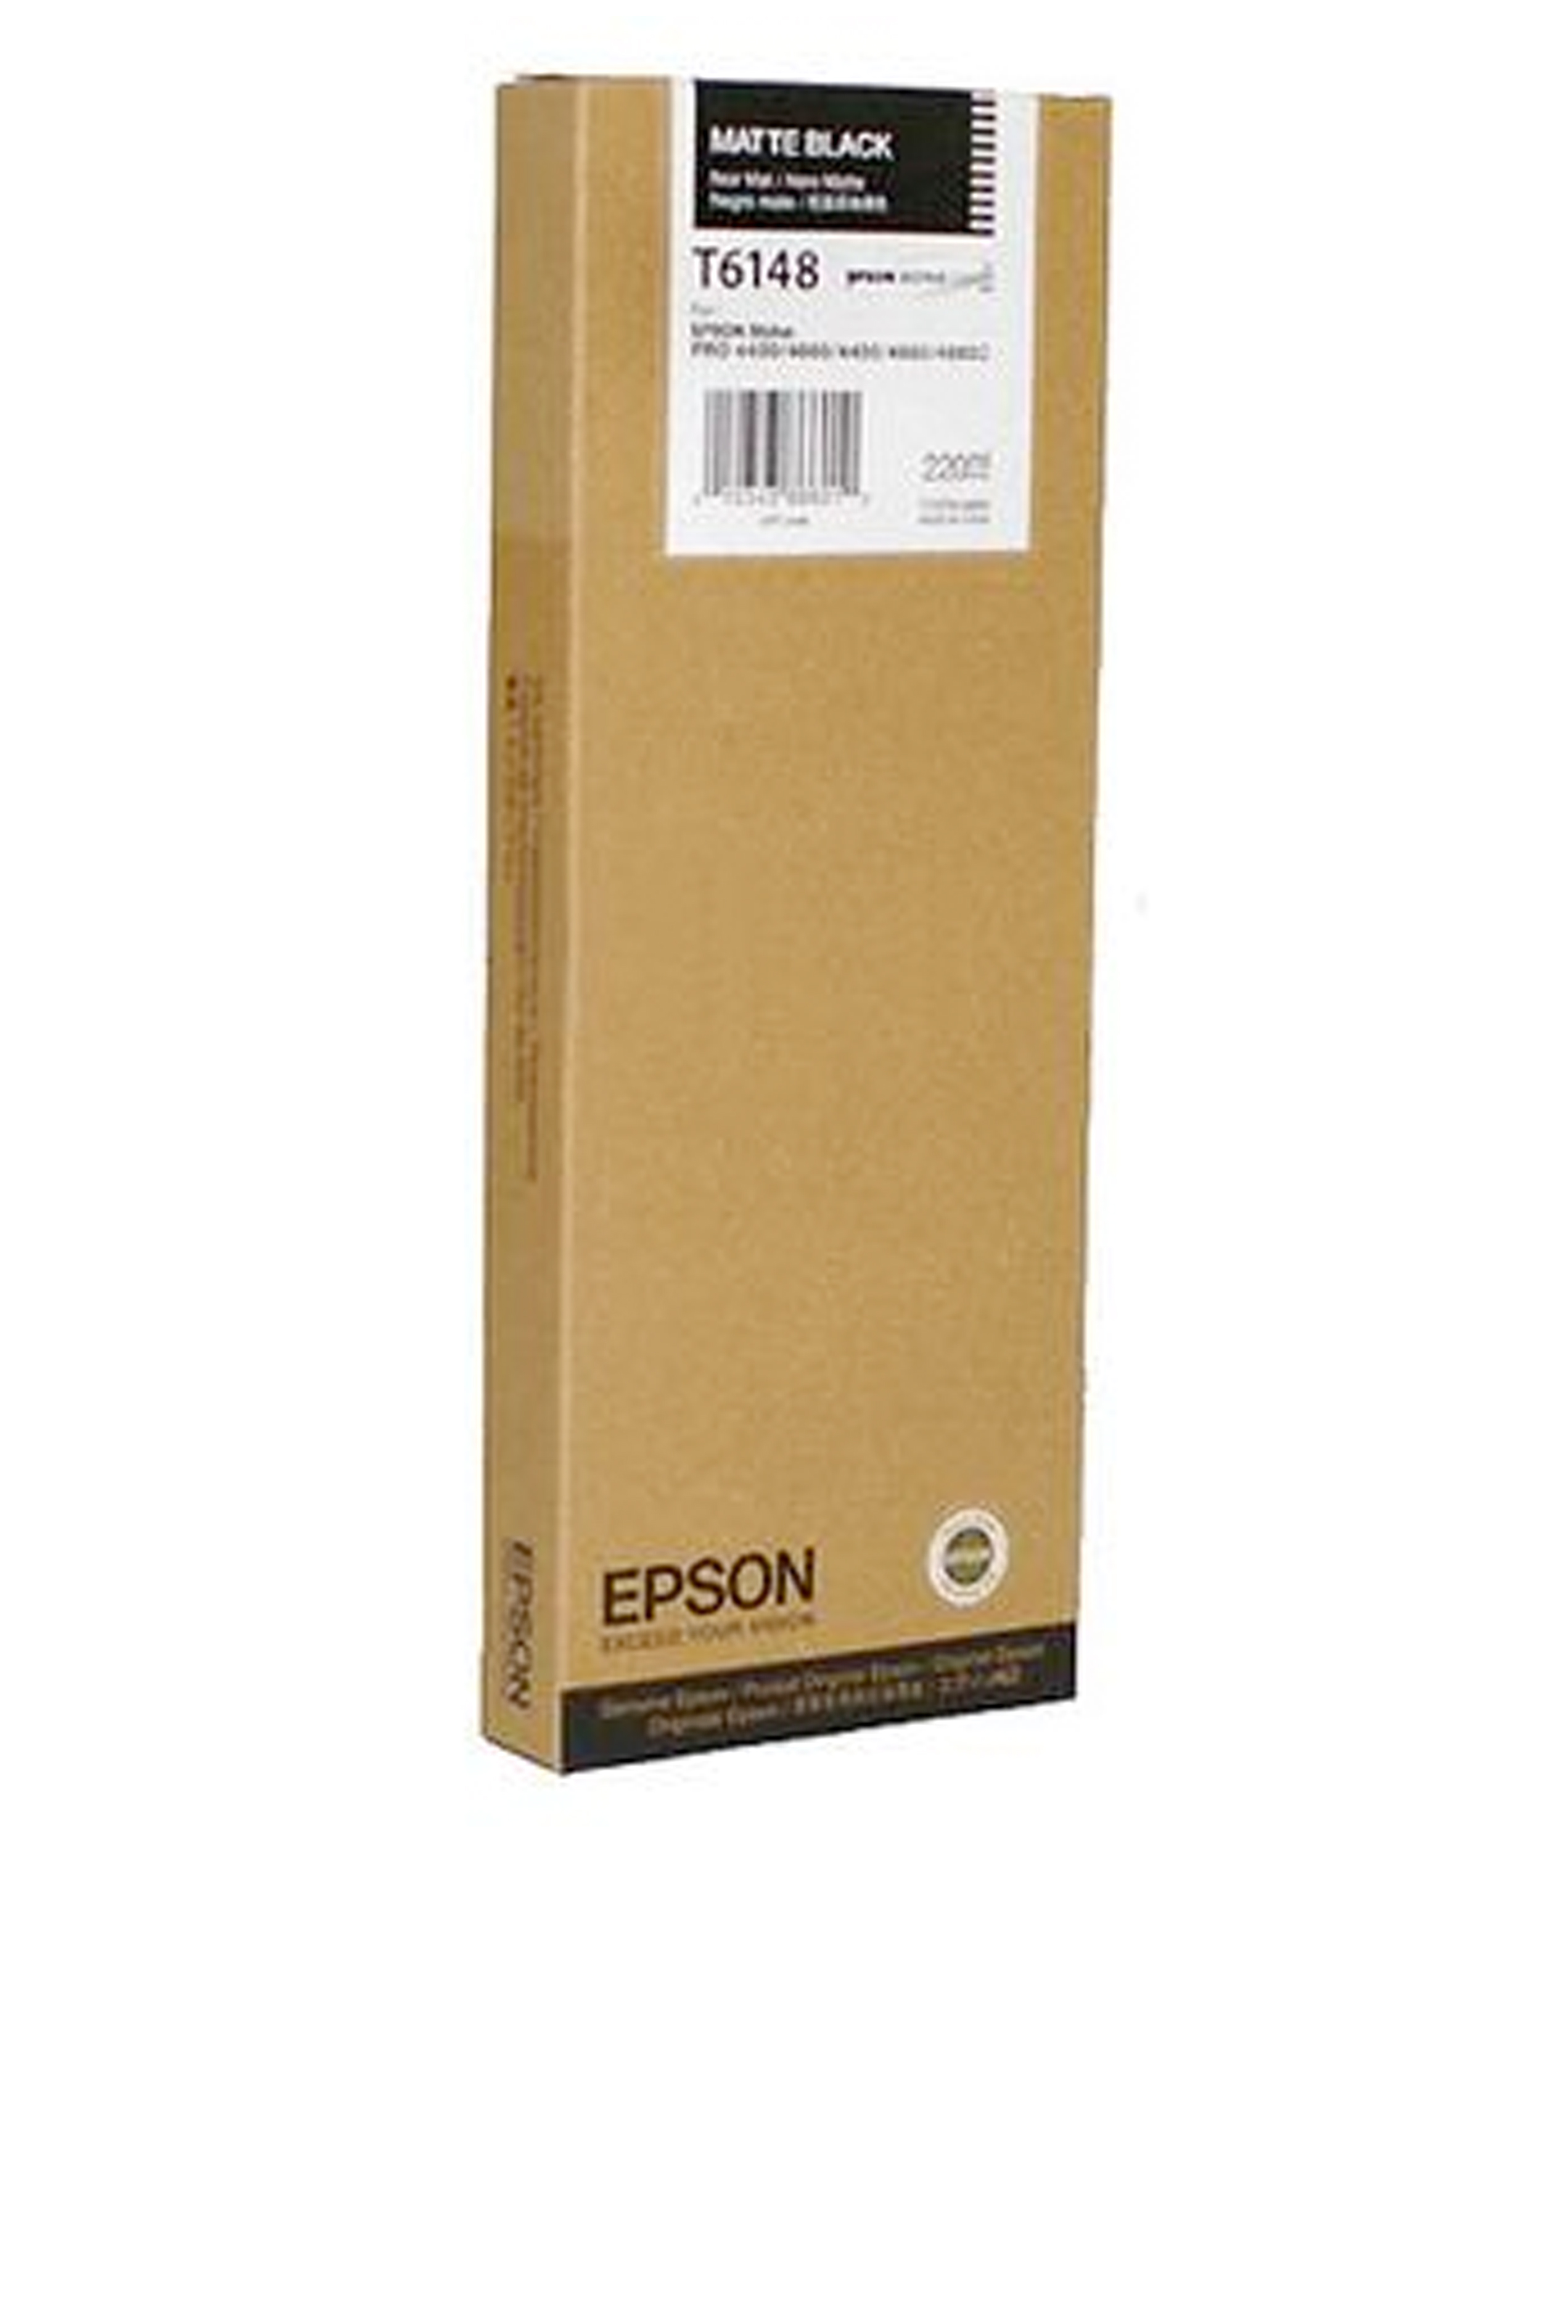 Epson EPSON HI MATTE BLACK INK (220 ML) (T614800)